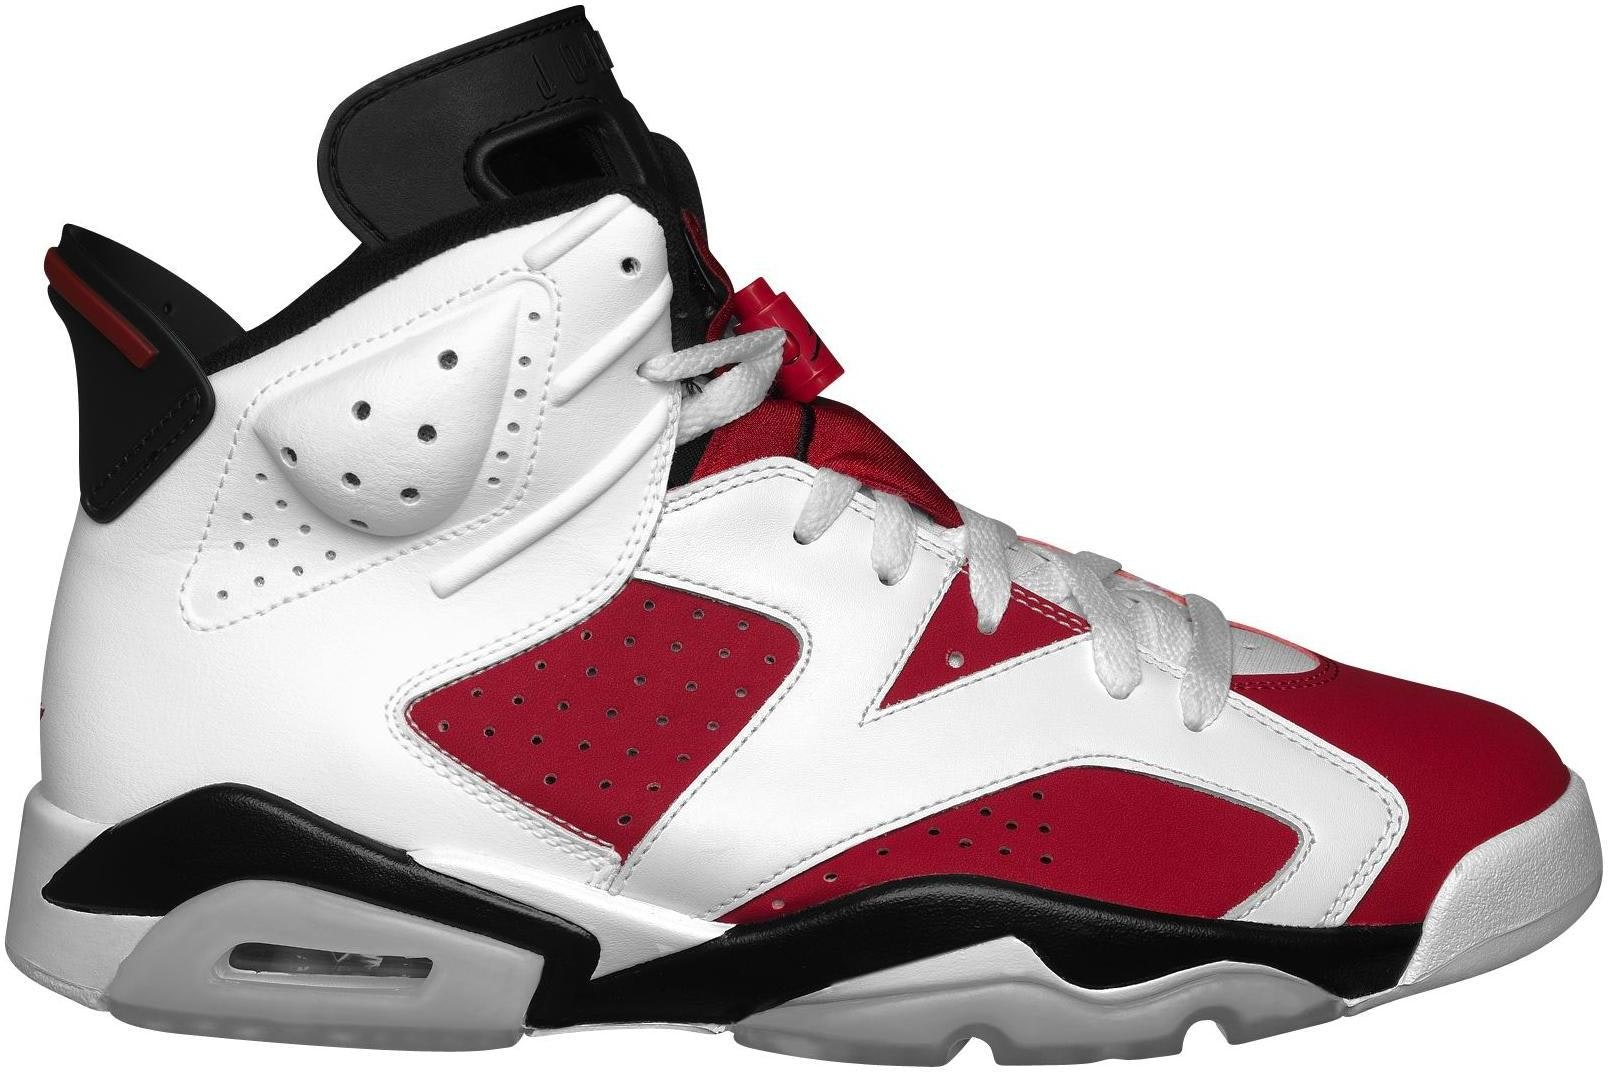 Jordan 6 Retro Carmine CDP (2008)